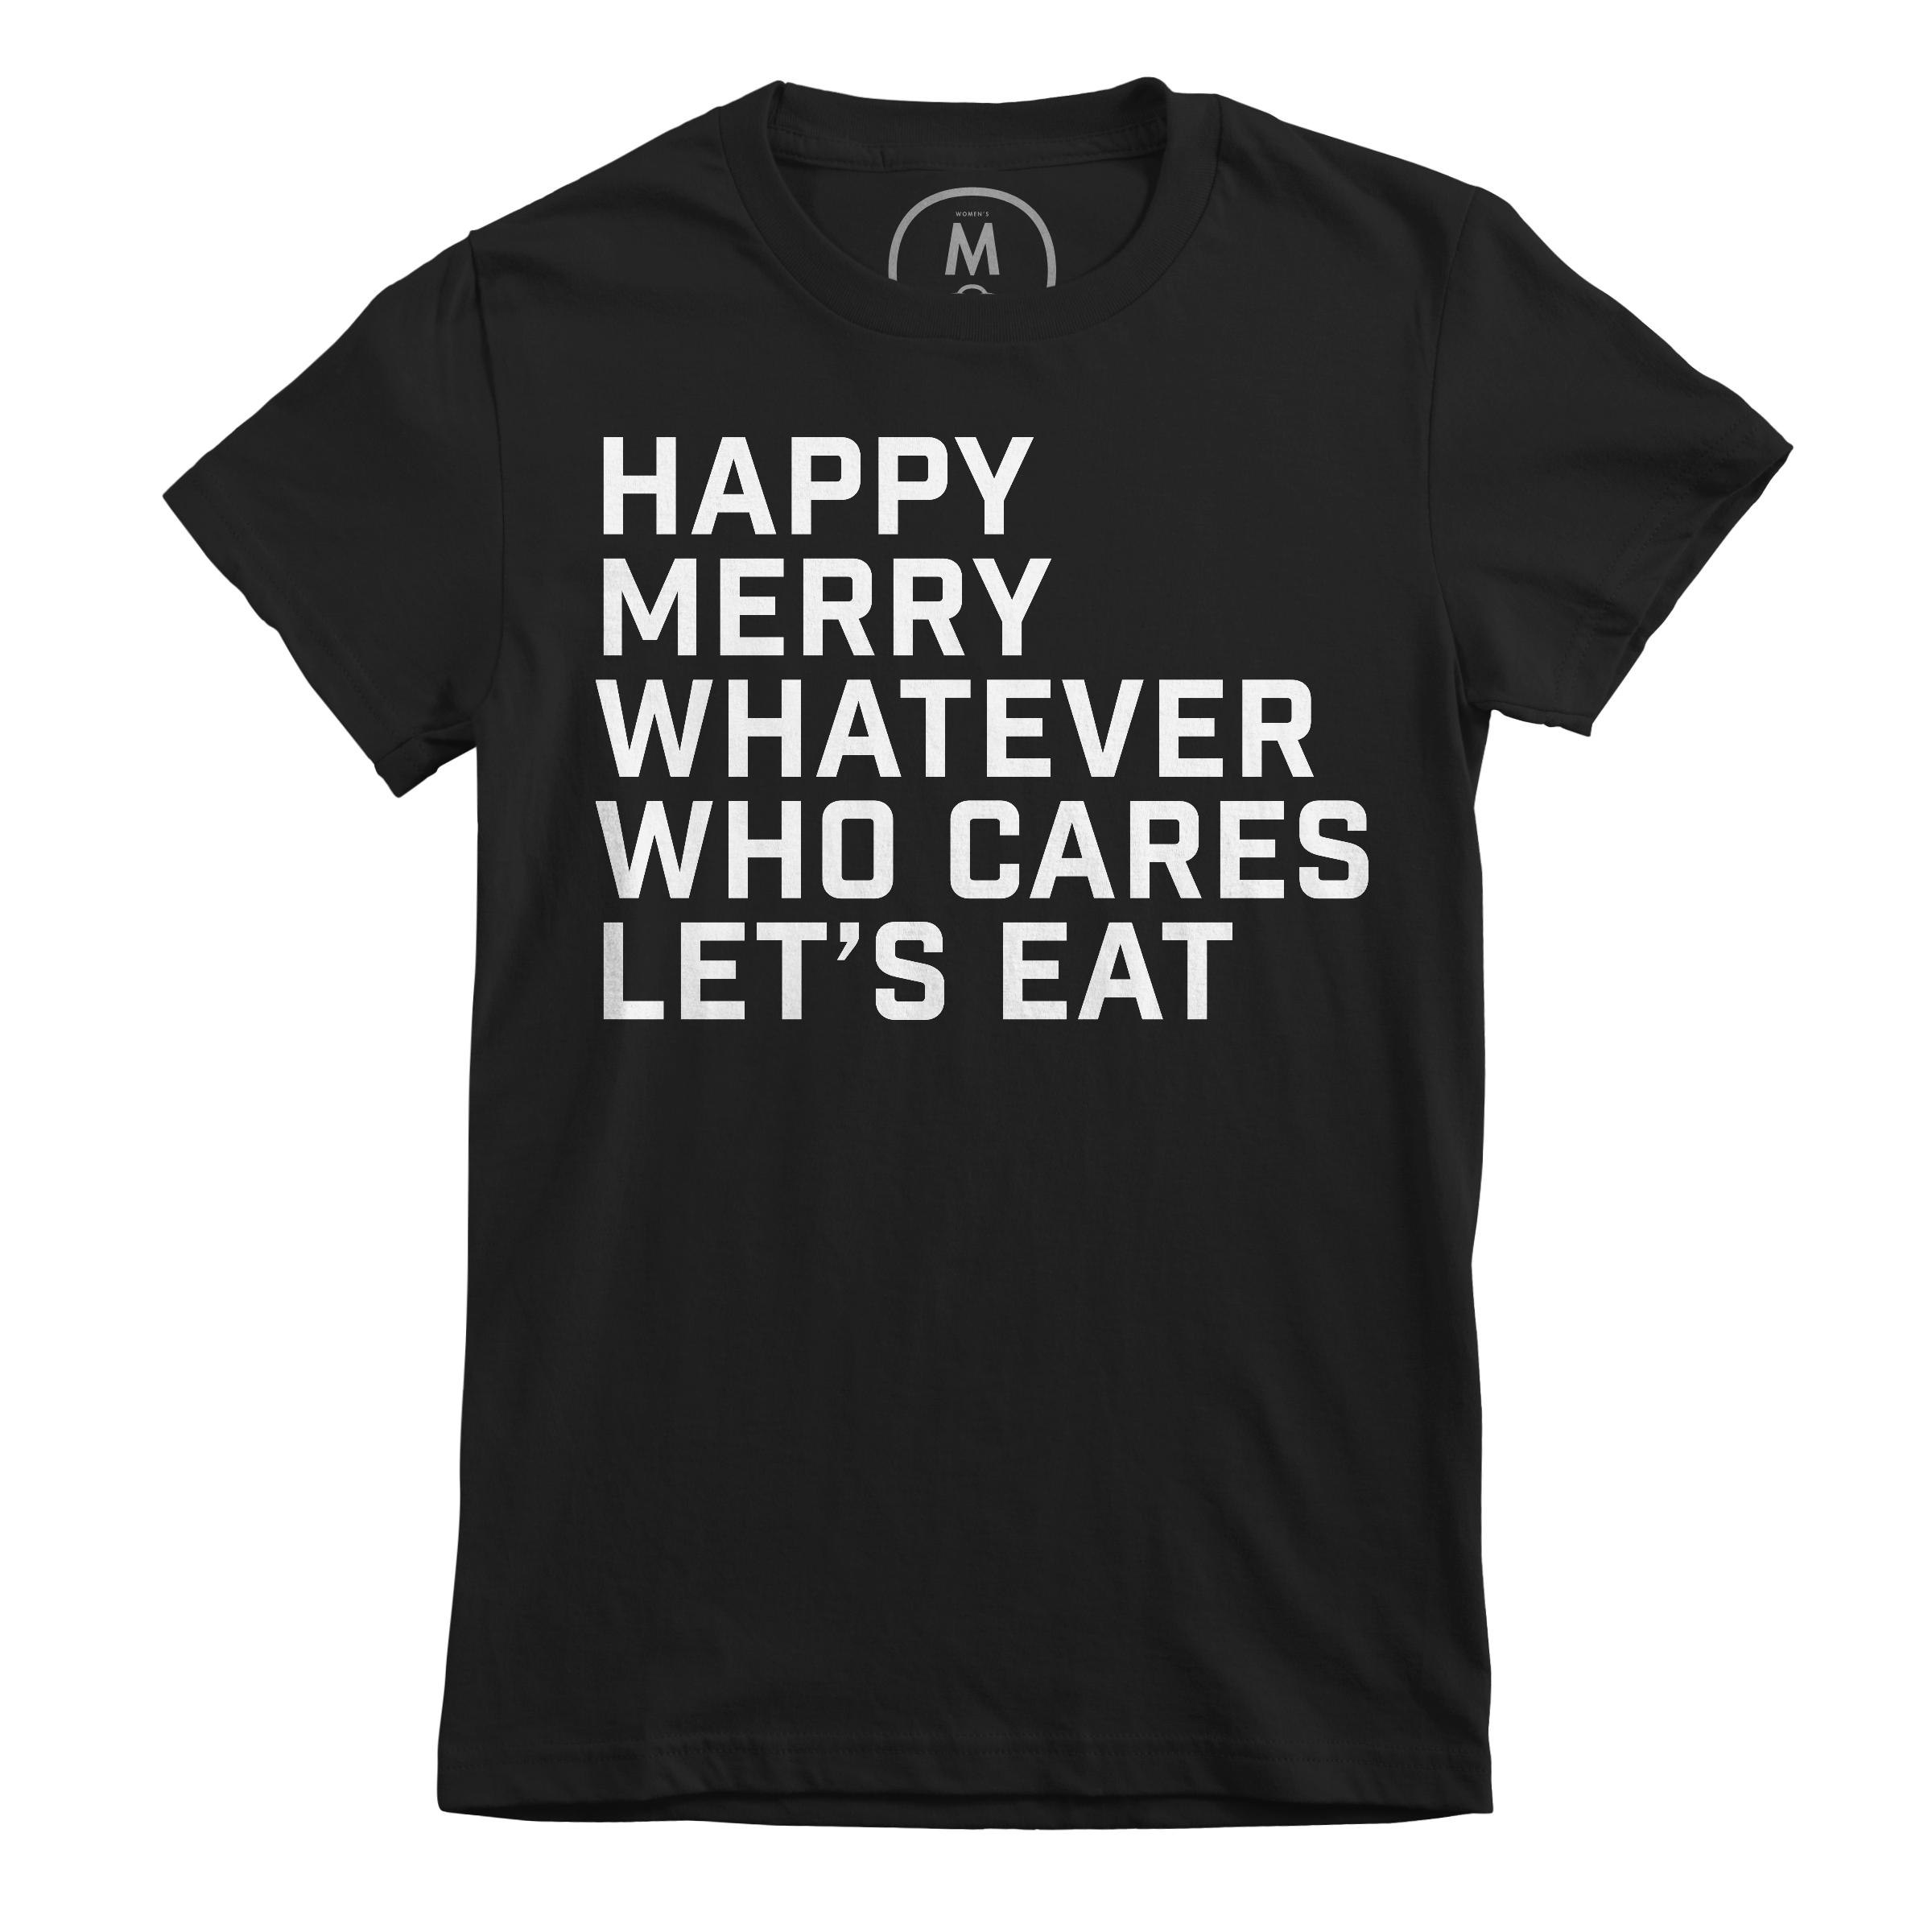 Let's Eat Black (Women's)